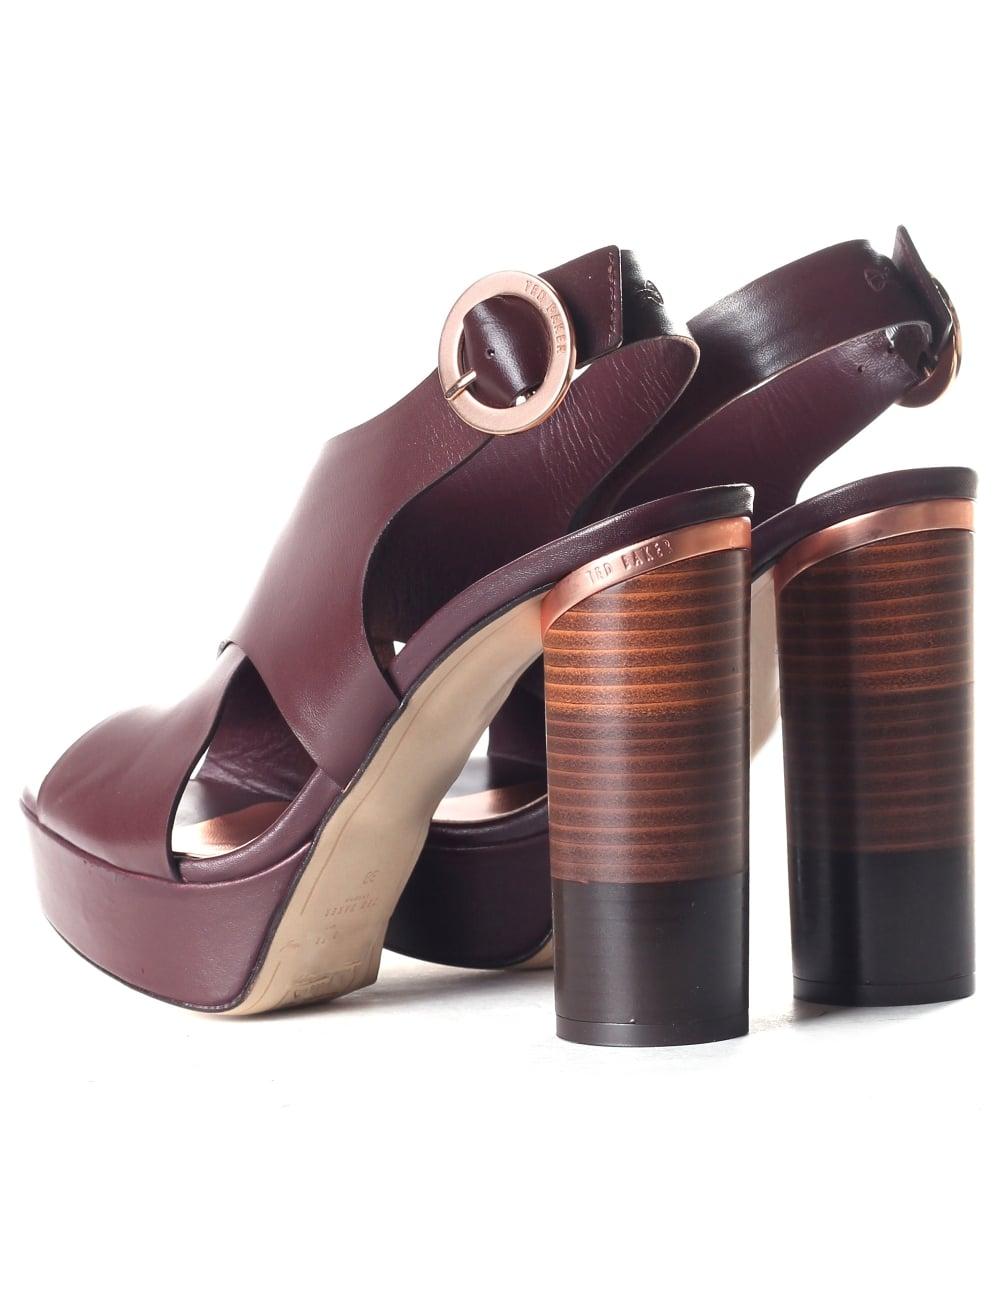 81f2d6679c96f Ted Baker Women's Kamilla Cross Over Leather Block Heel Sandals